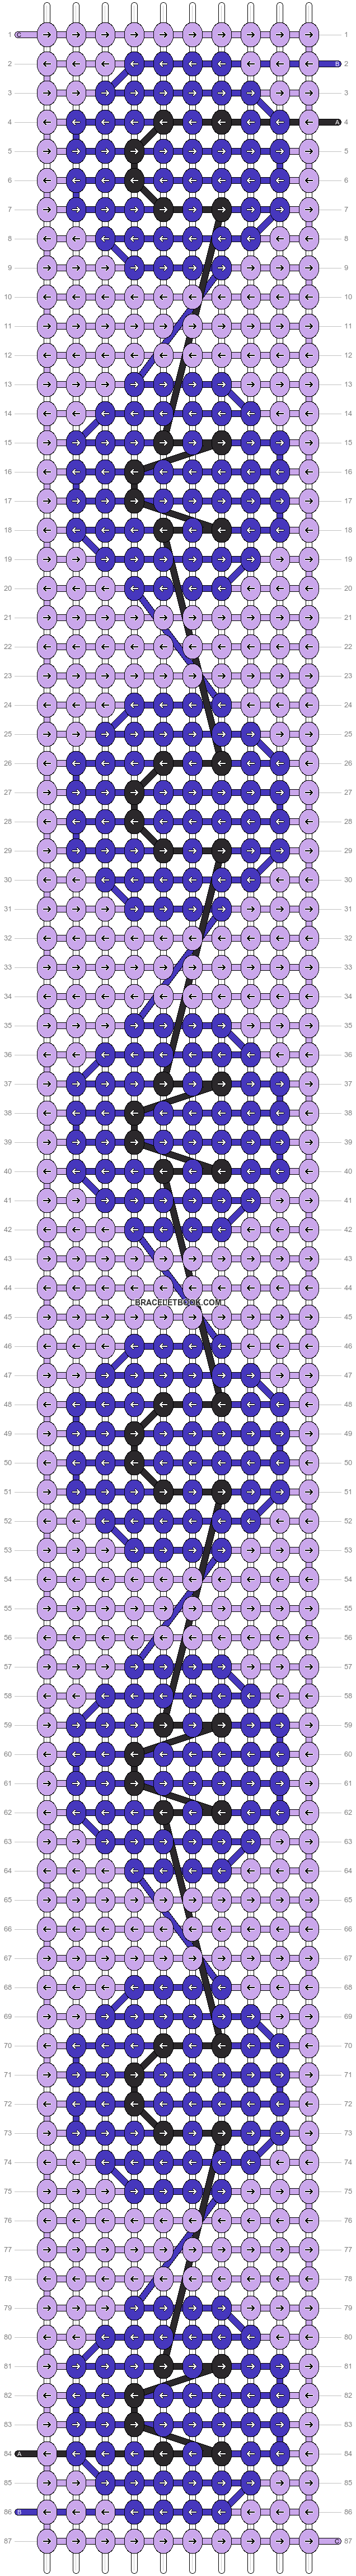 Alpha pattern #86446 variation #156427 pattern